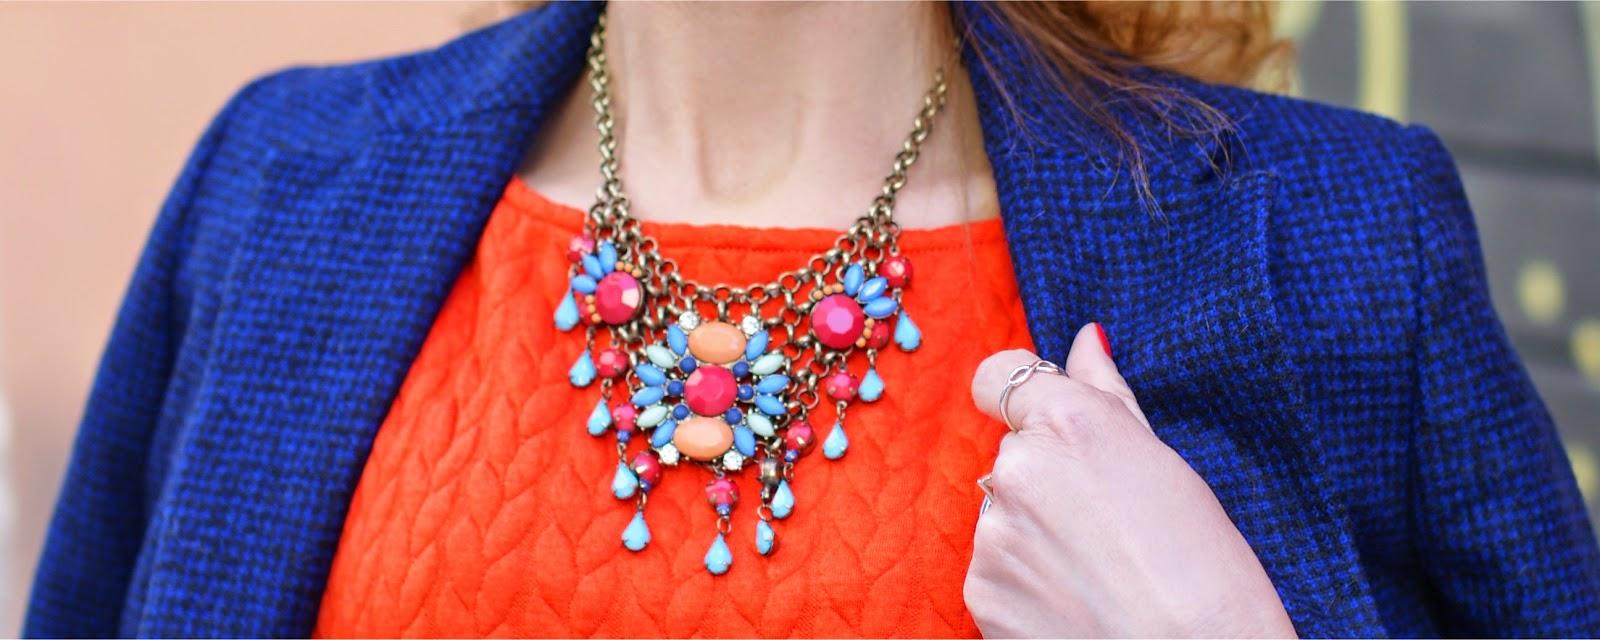 Helene Berman coat, bijou brigitte necklace, Fashion and Cookies fashion blog, fashion blogger